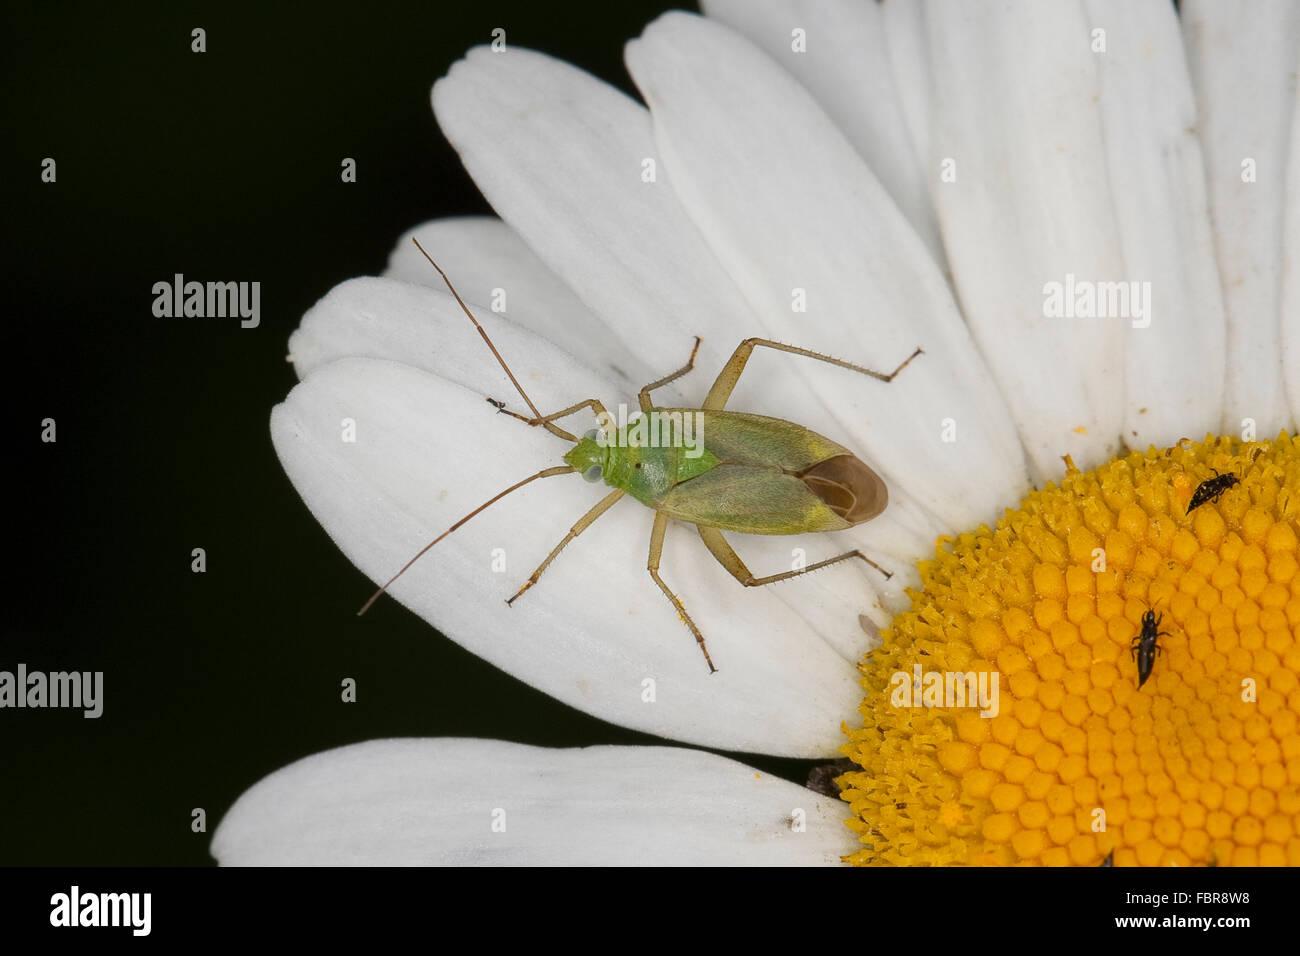 Potato Bug, Potato Capsid, Strawberry Bug, Zweipunktige Wiesenwanze, Weichwanze, Closterotomus norvegicus, Cimex - Stock Image